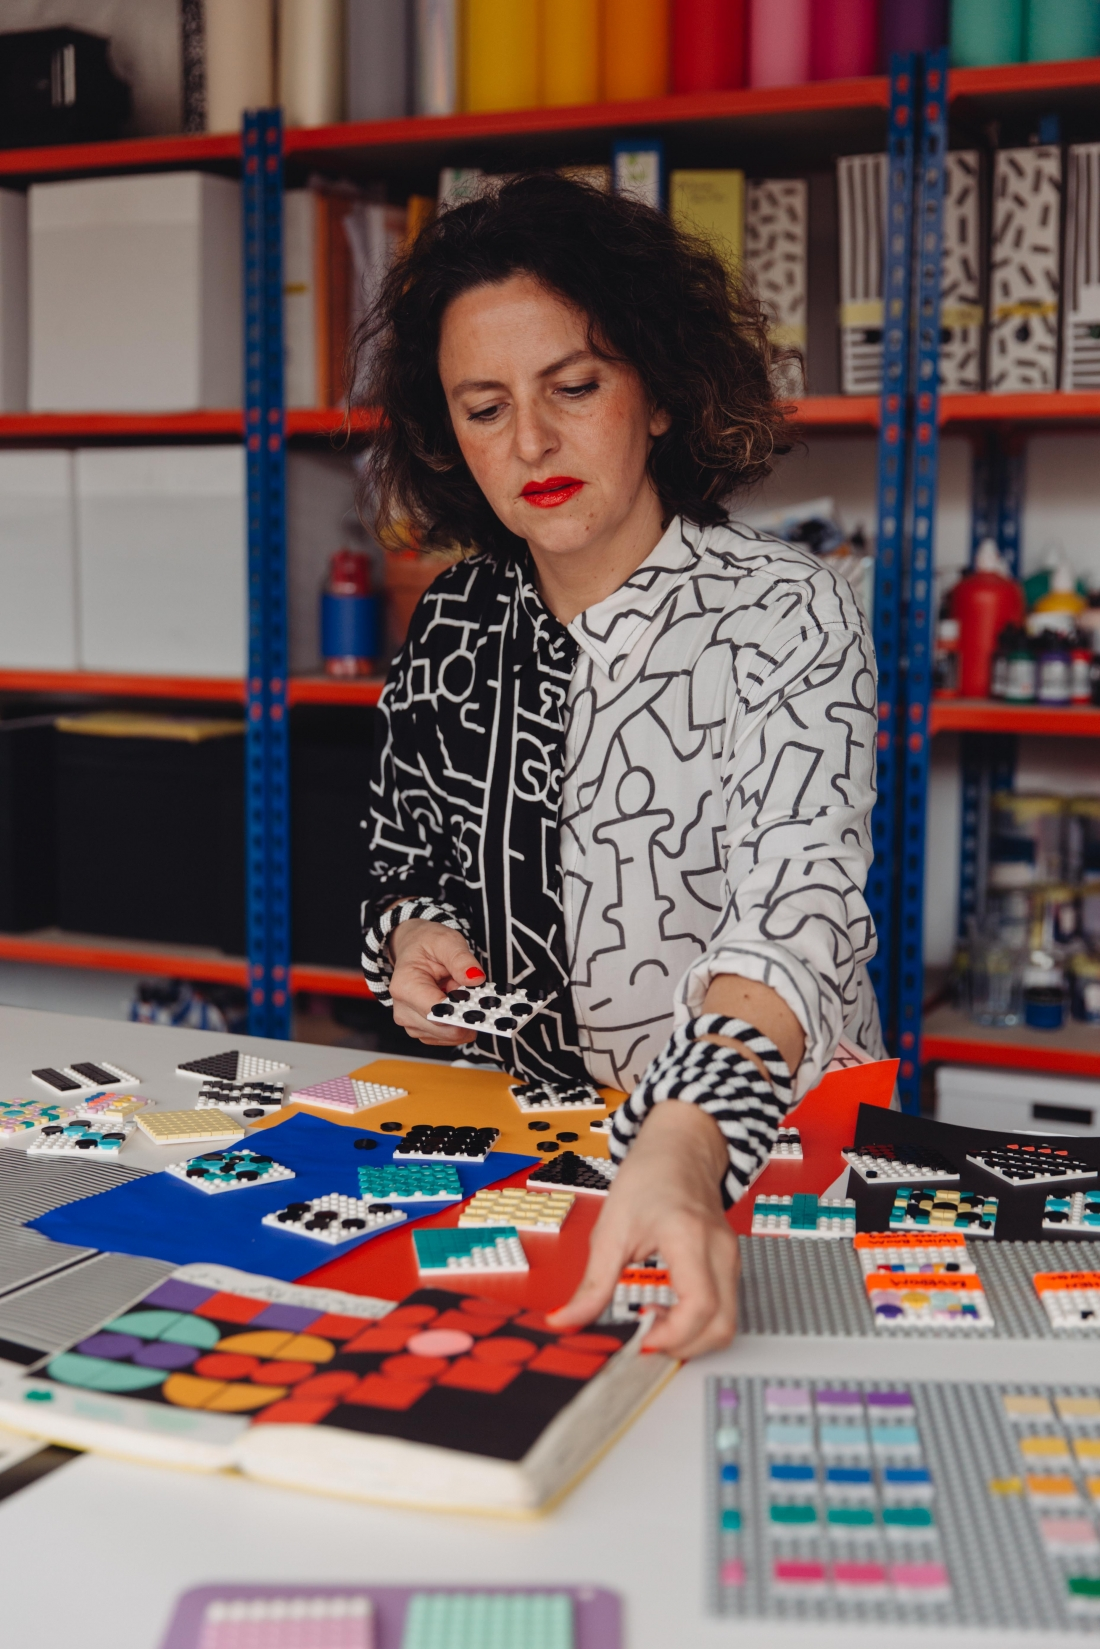 Camille Walala in studio 2020 Photo Credit Dunja Opalko